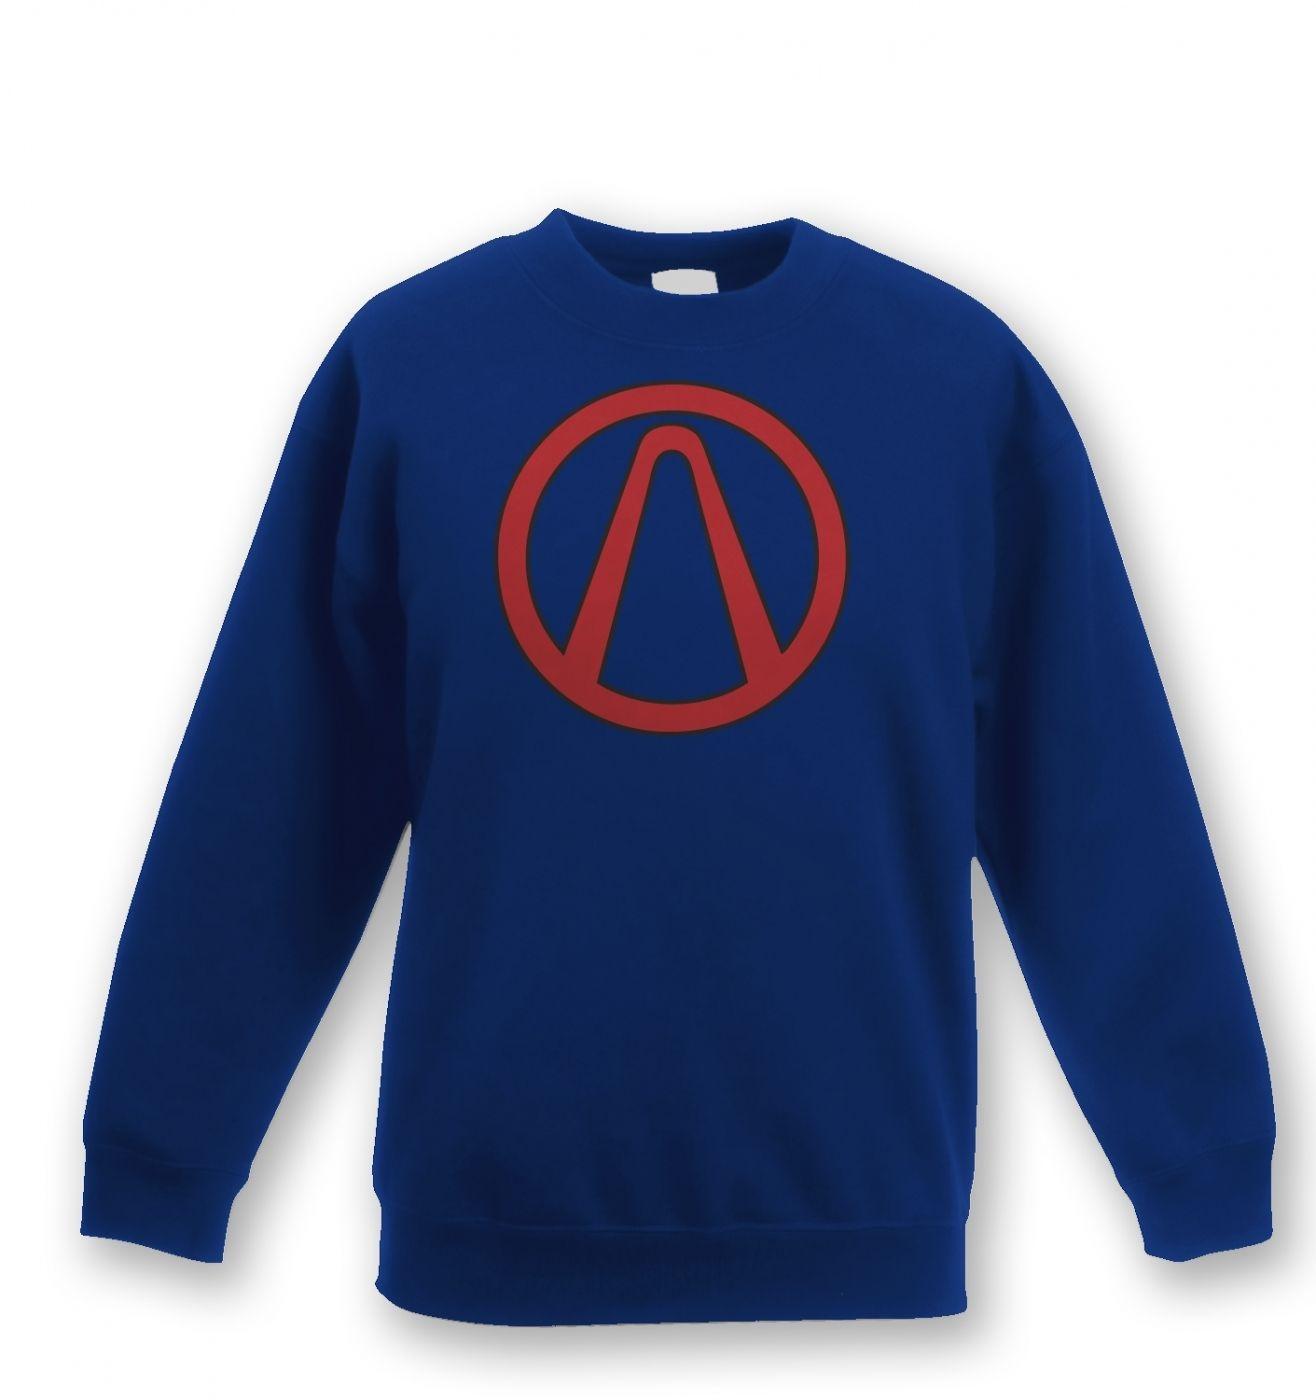 Vault Symbol kids' sweatshirt